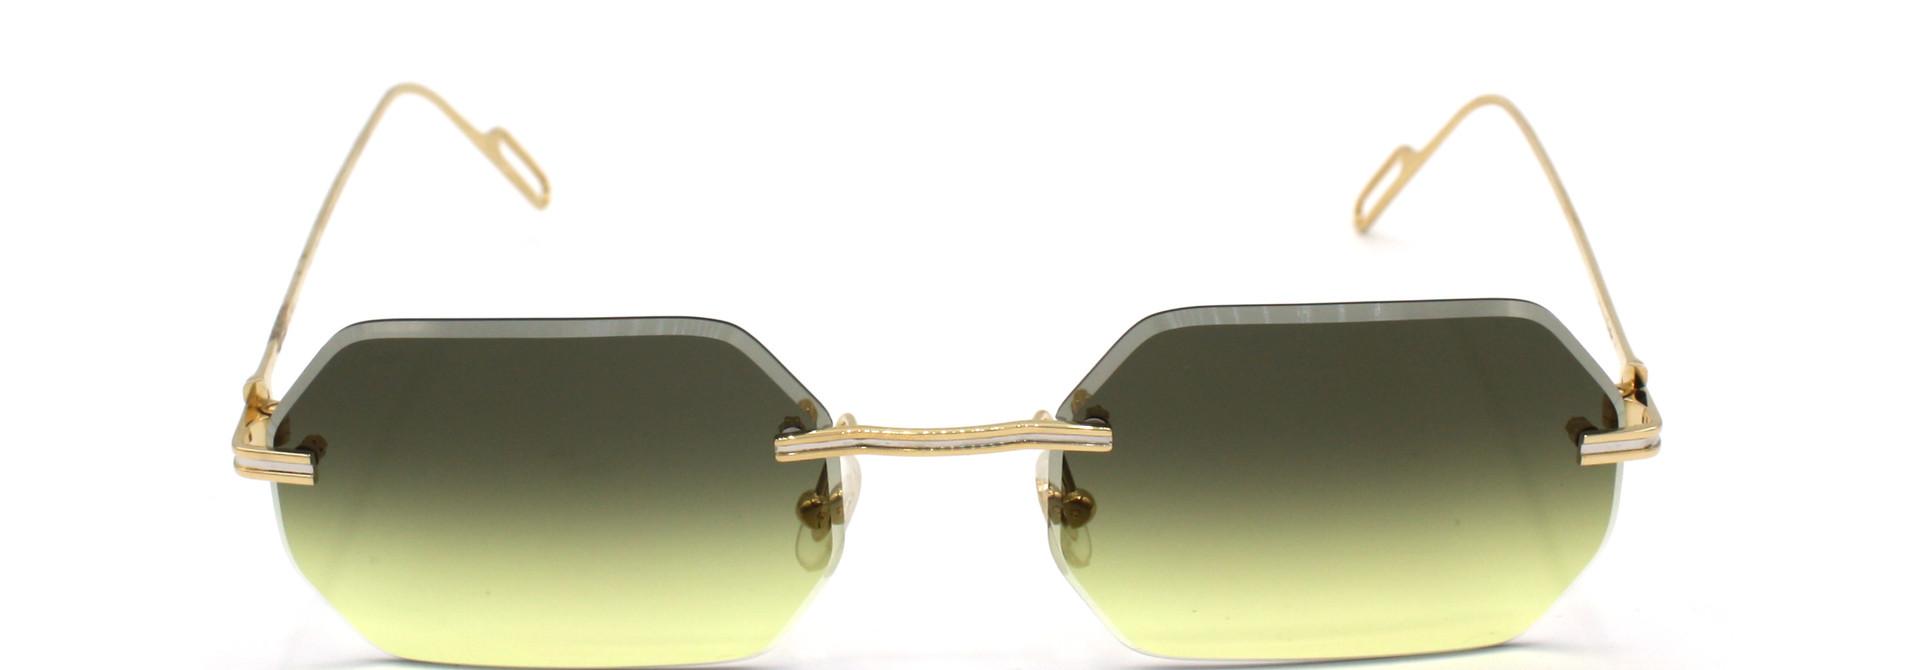 Cartier CT0113O - 002 SHIVA DIAMOND CUT